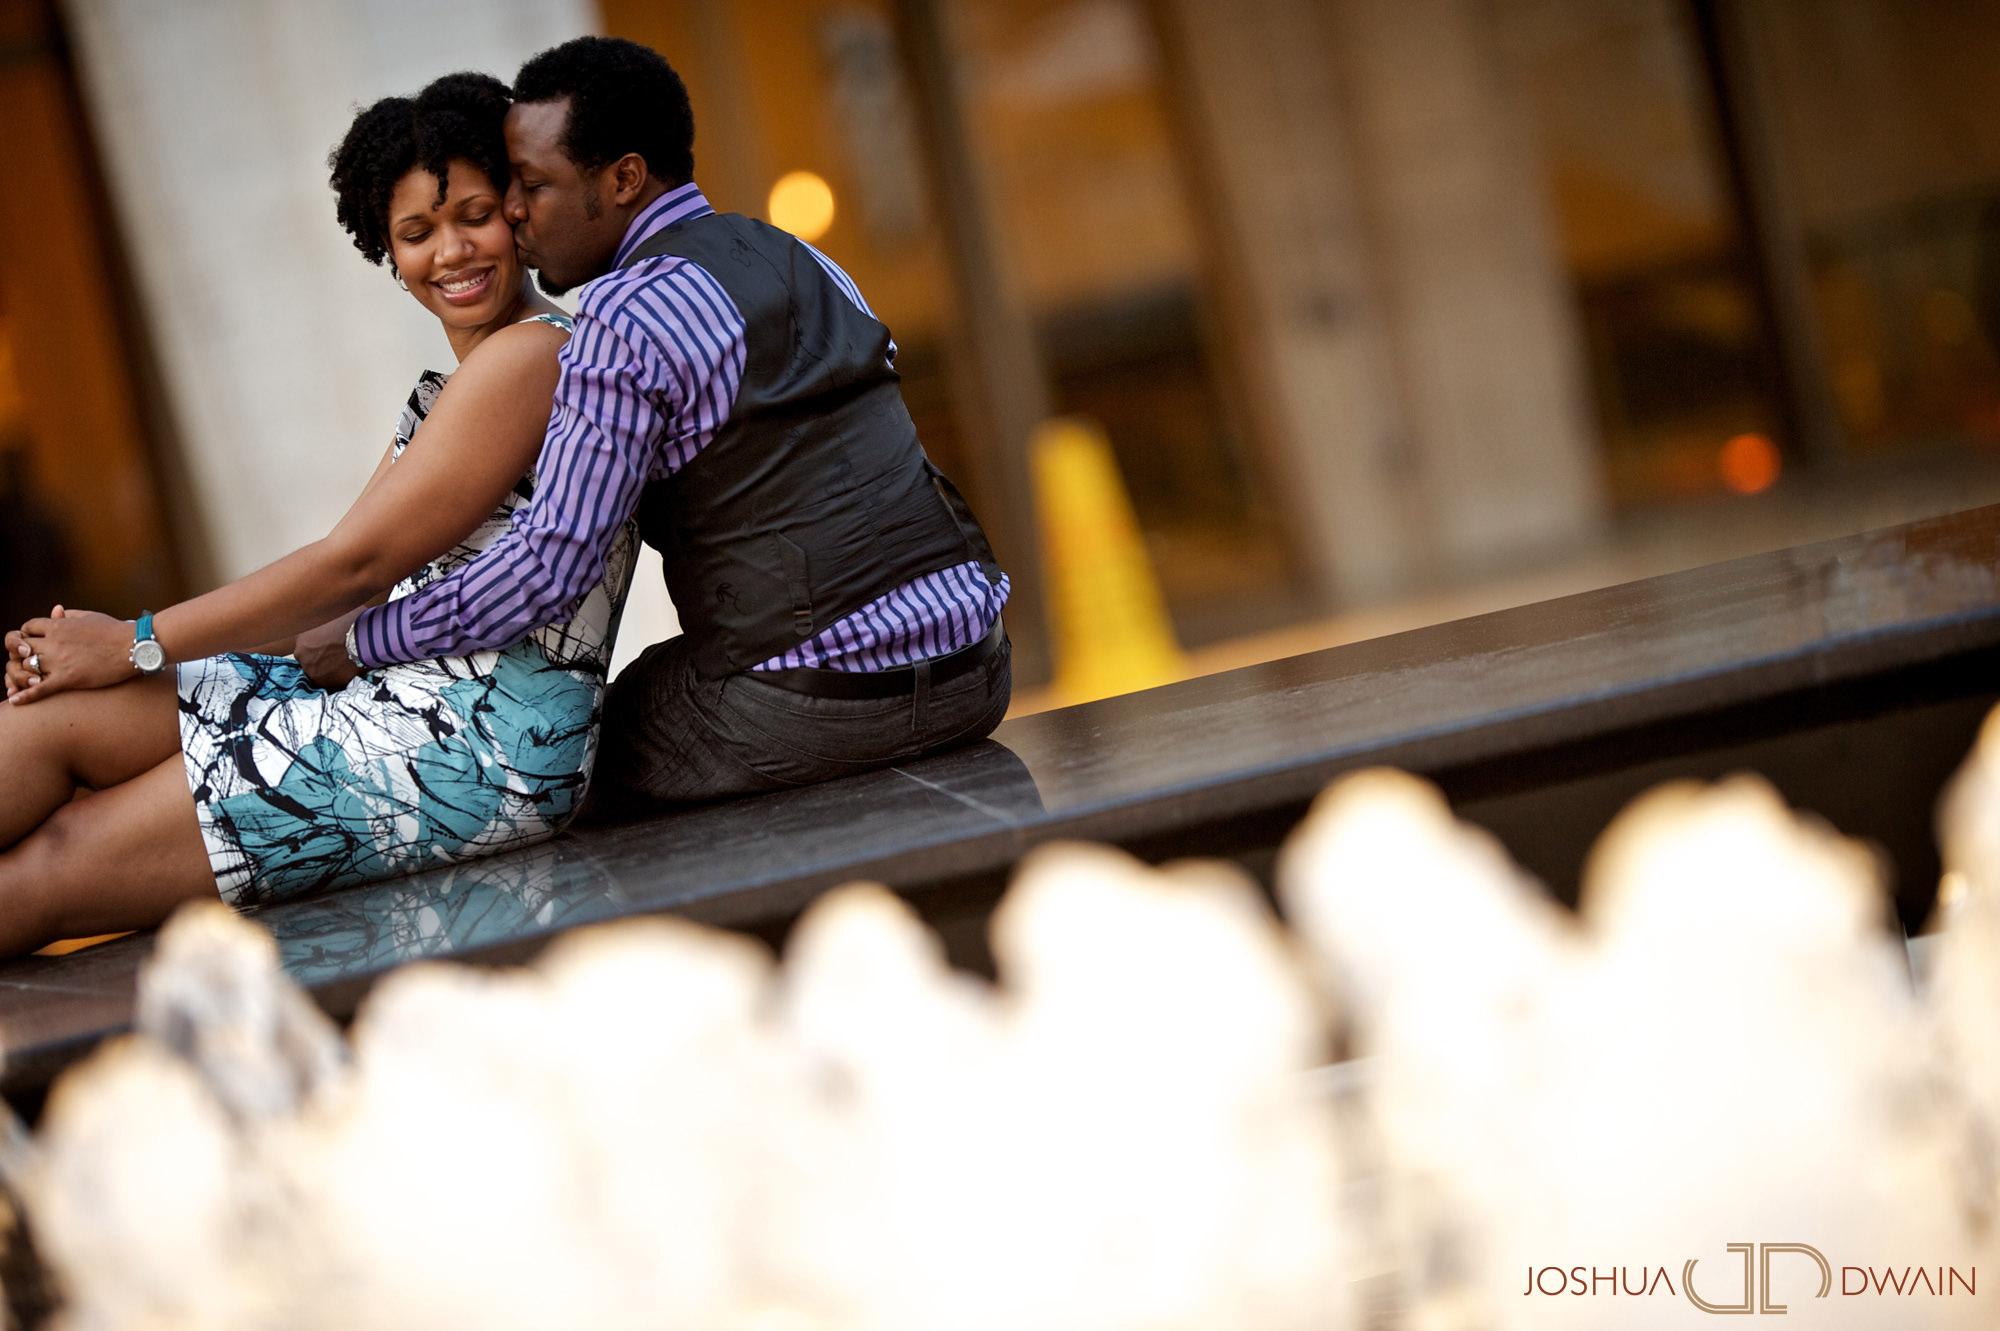 betty-garnel-007-central-park-new-york-city-ny-engagement-photographer-joshua-dwain-20110527_bg_062